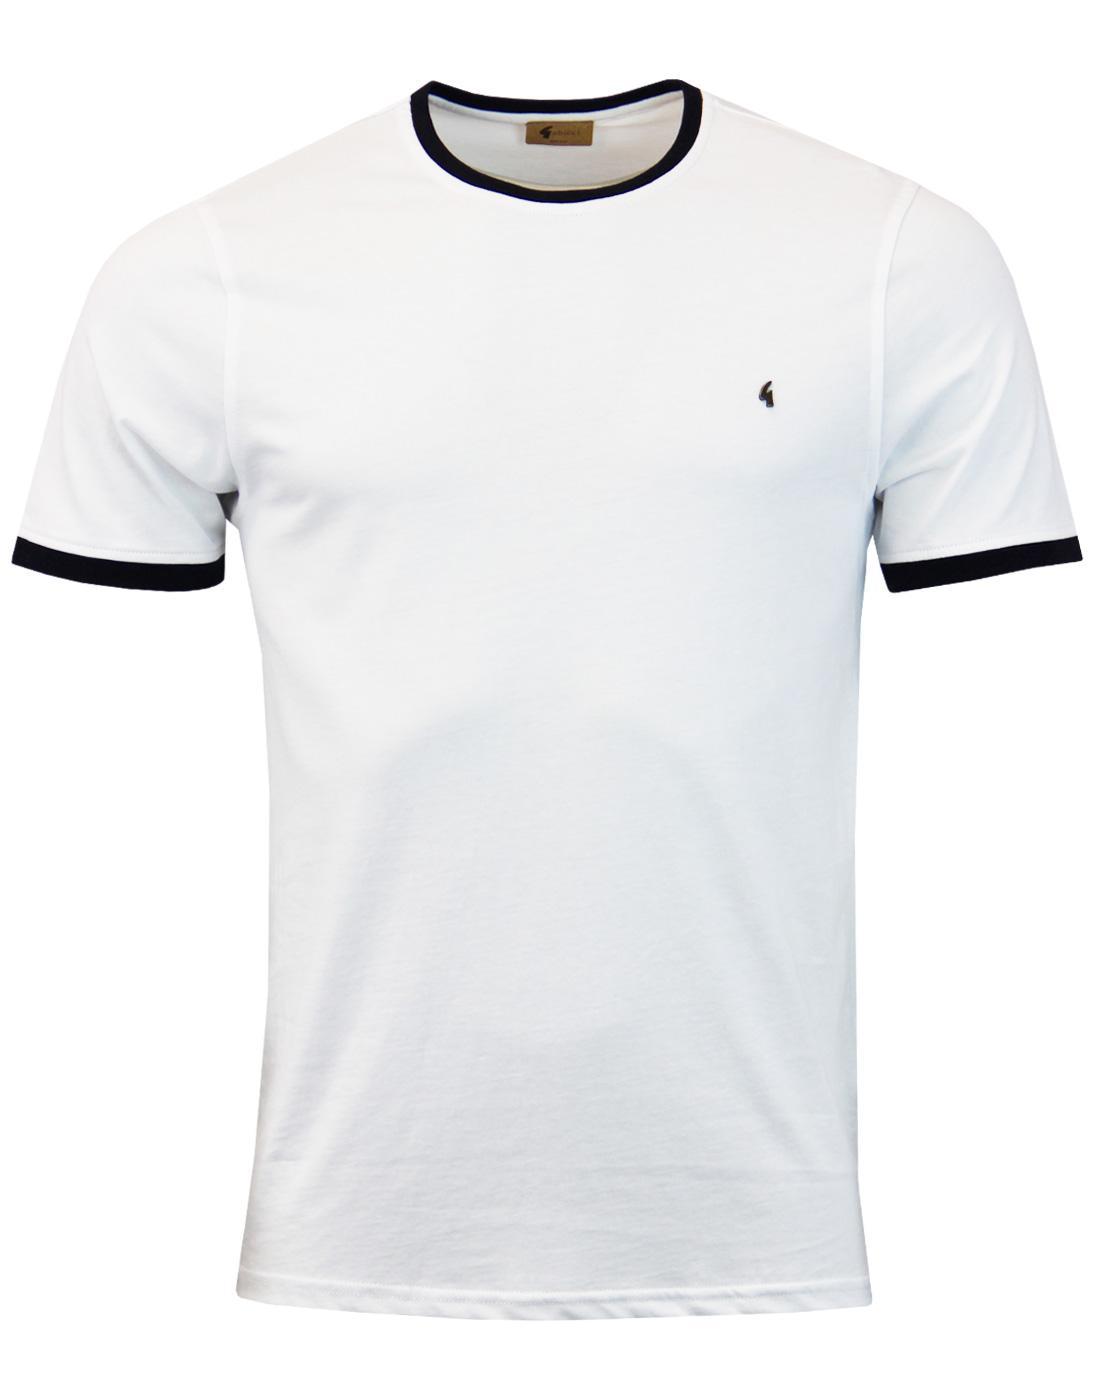 GABICCI VINTAGE Retro 60s Mod Ringer T-shirt WHITE